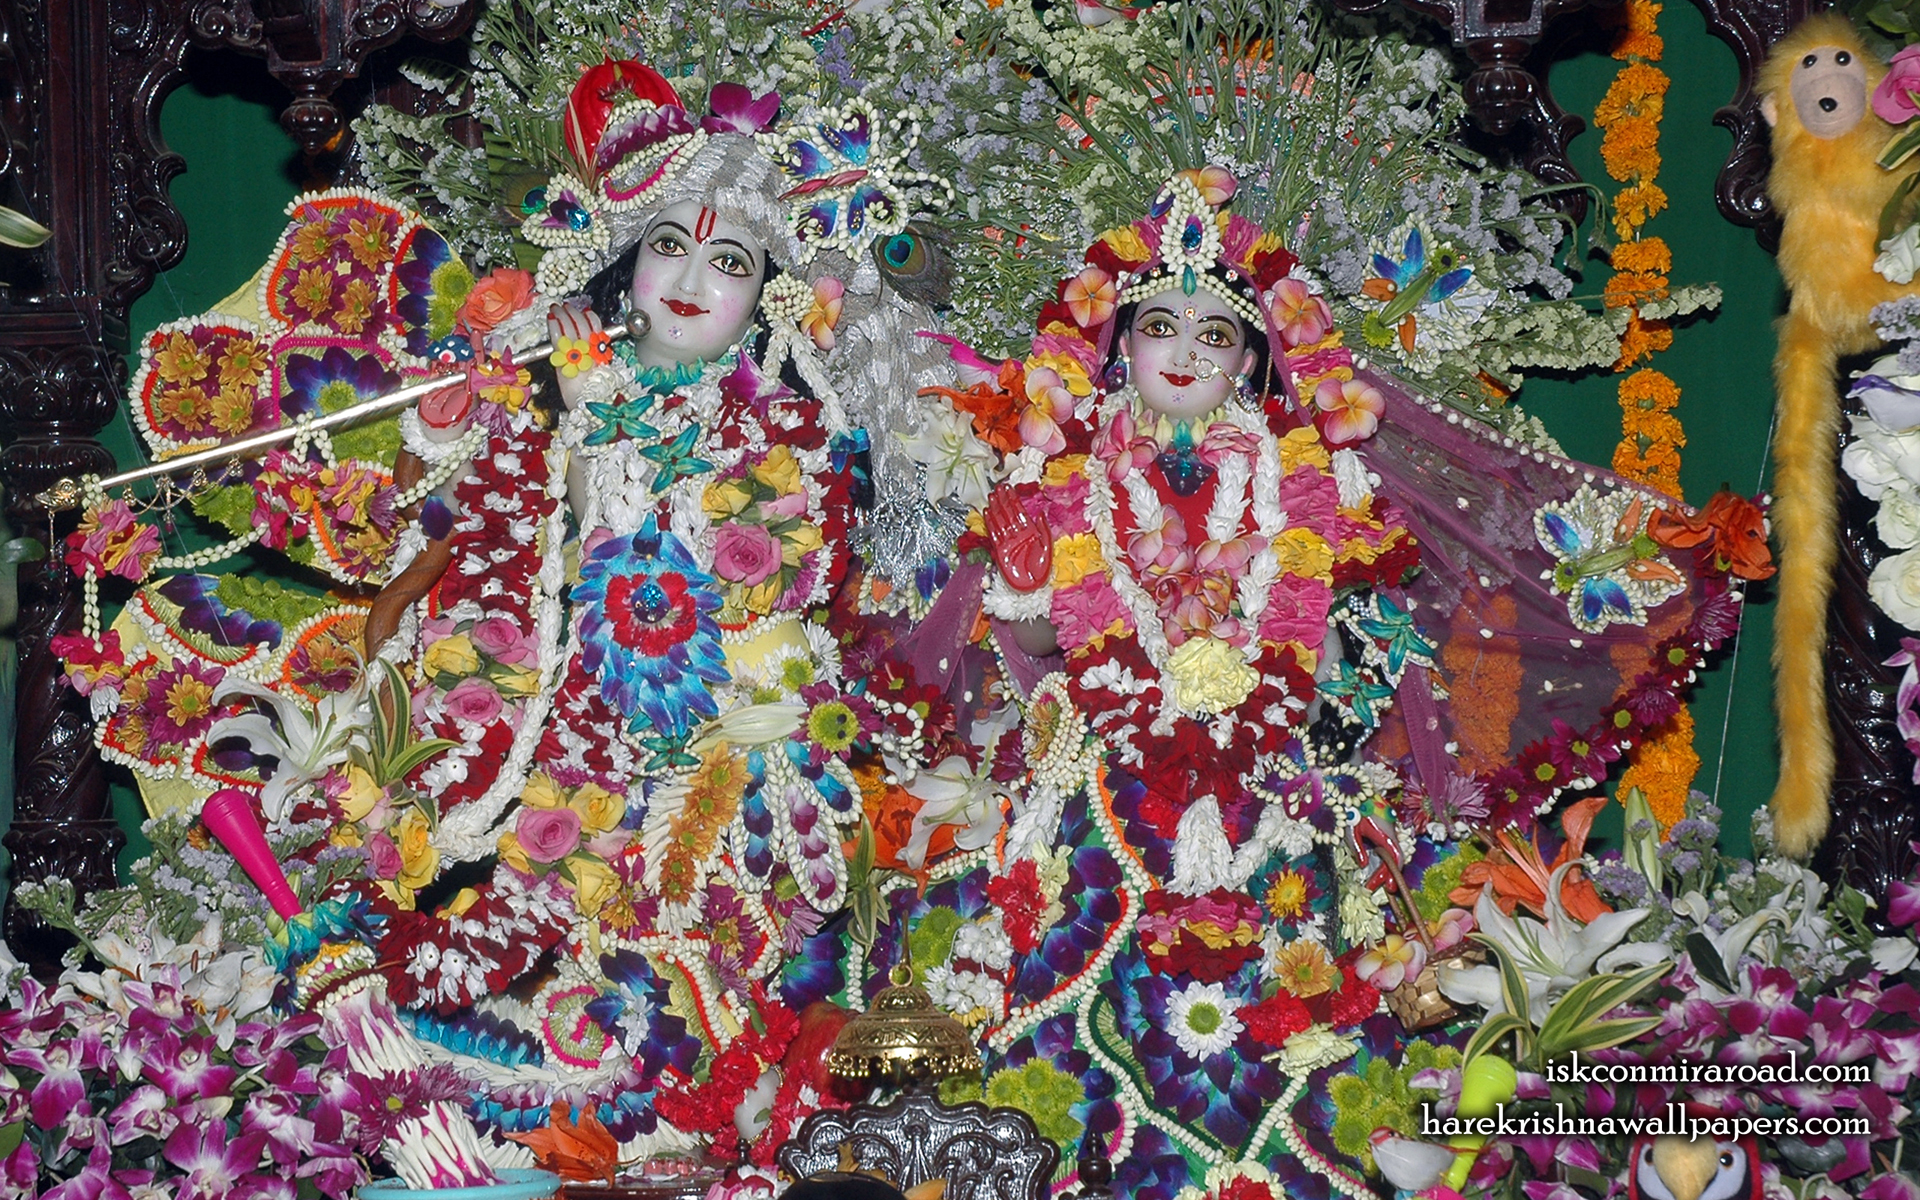 Sri Sri Radha Giridhari Wallpaper (012) Size 1920x1200 Download